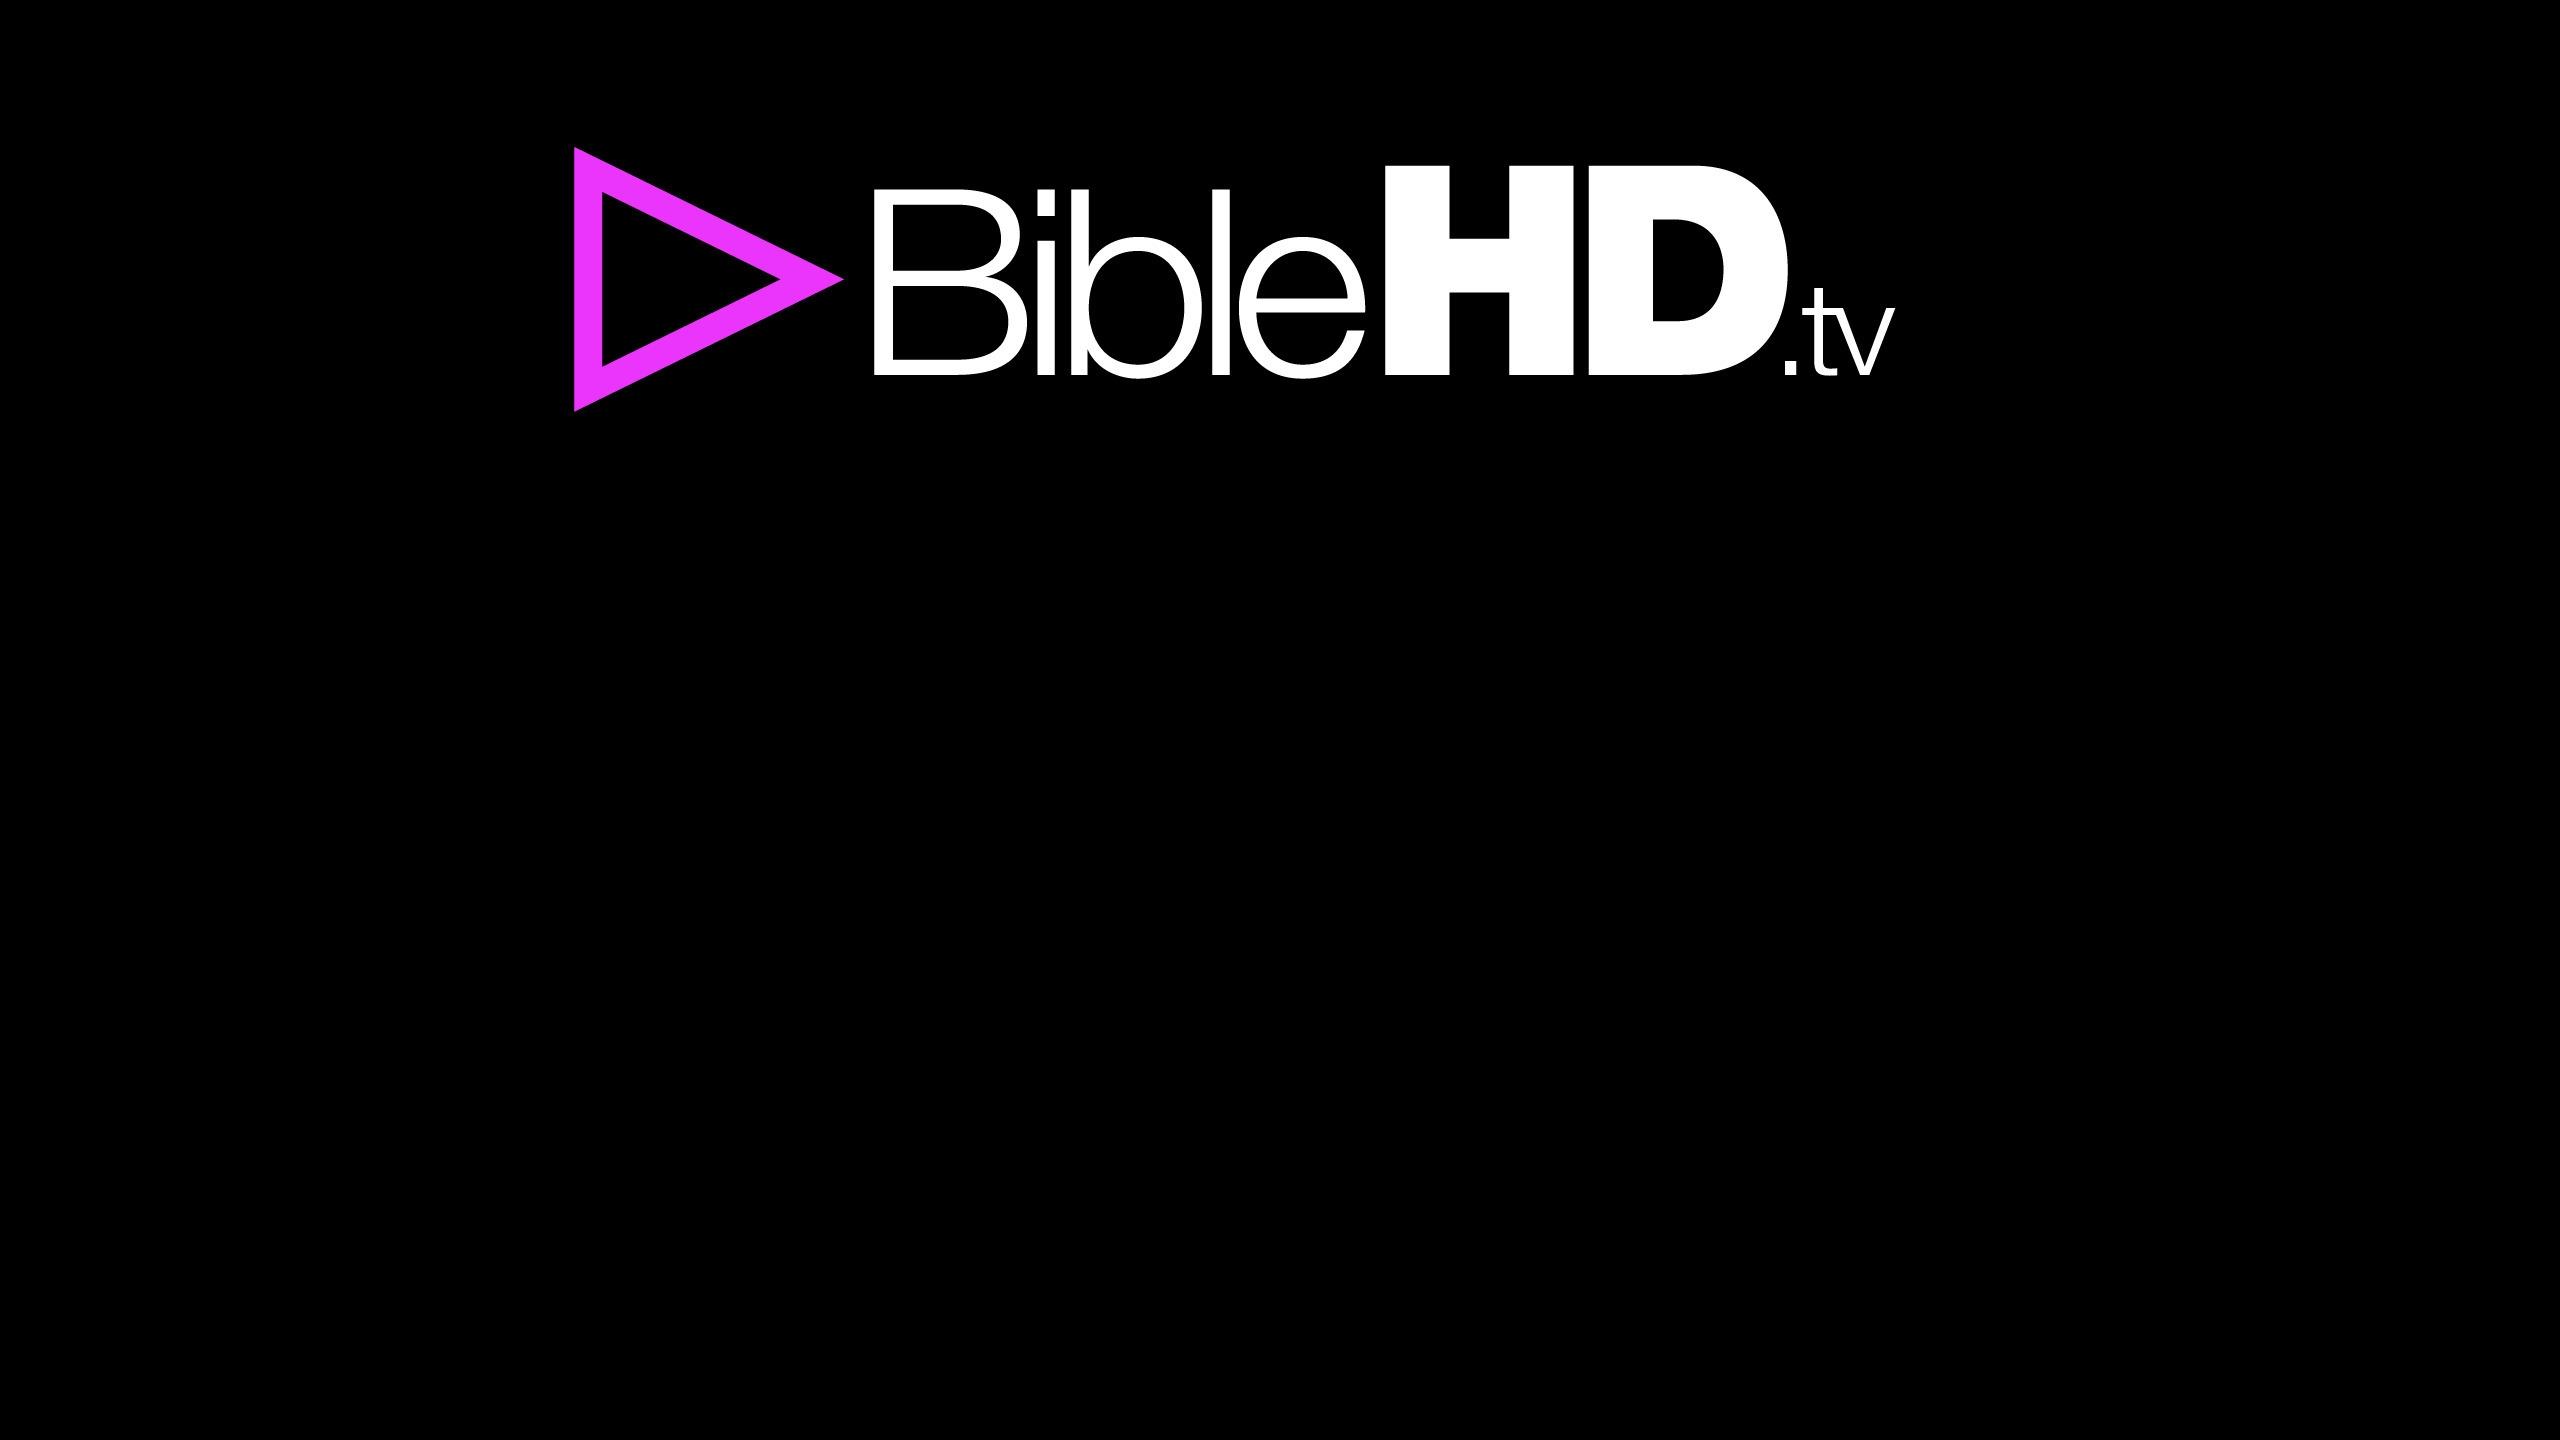 BibleHDtv (@biblehd) Cover Image